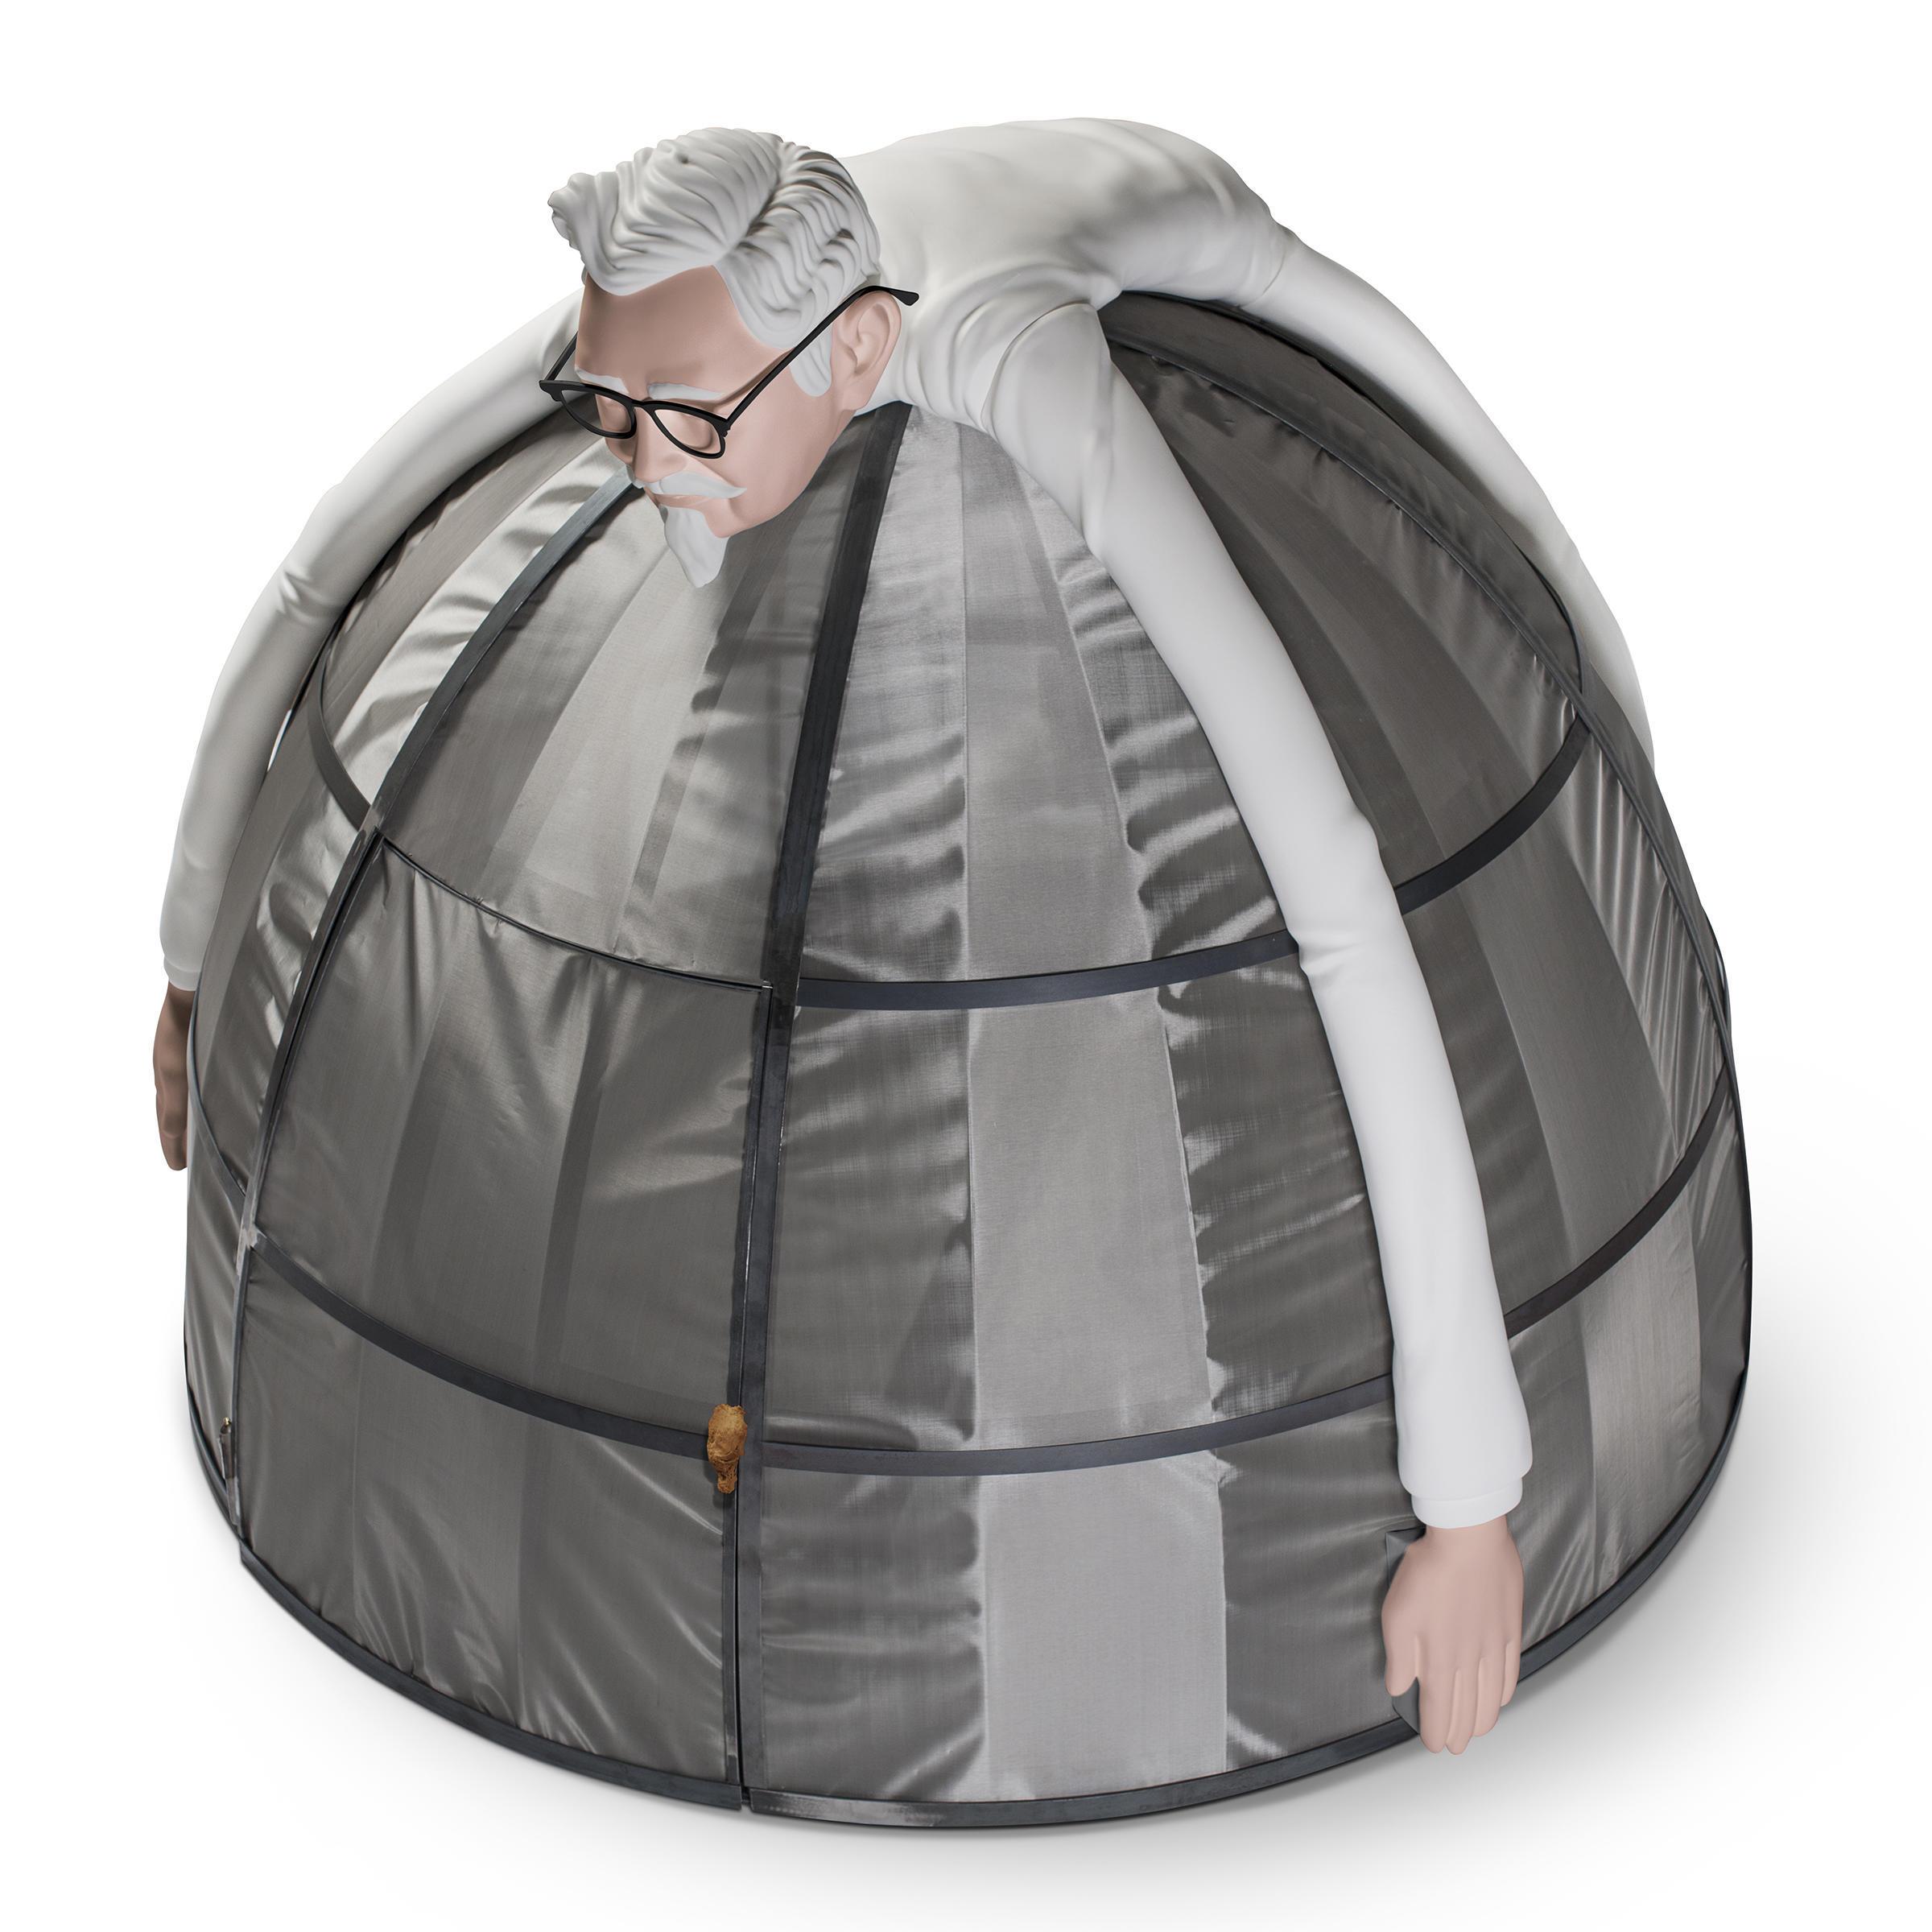 KFC Internet Escape Pod HALF OFF $5000